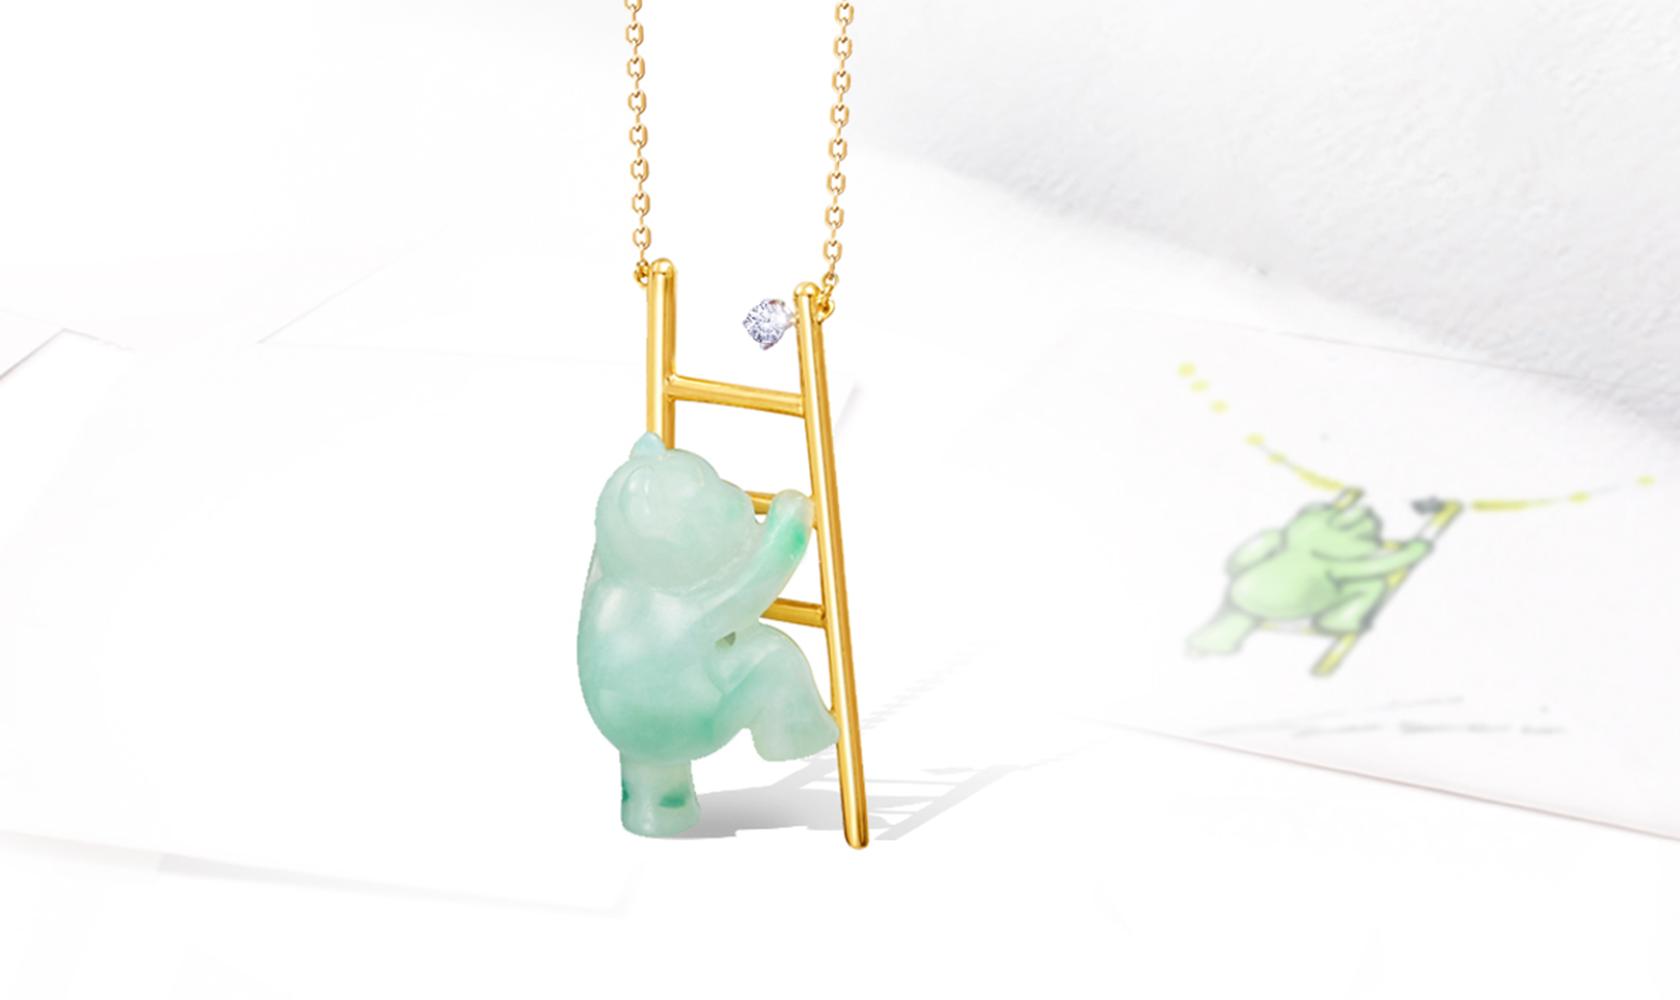 Lin Shiao Tung necklace.